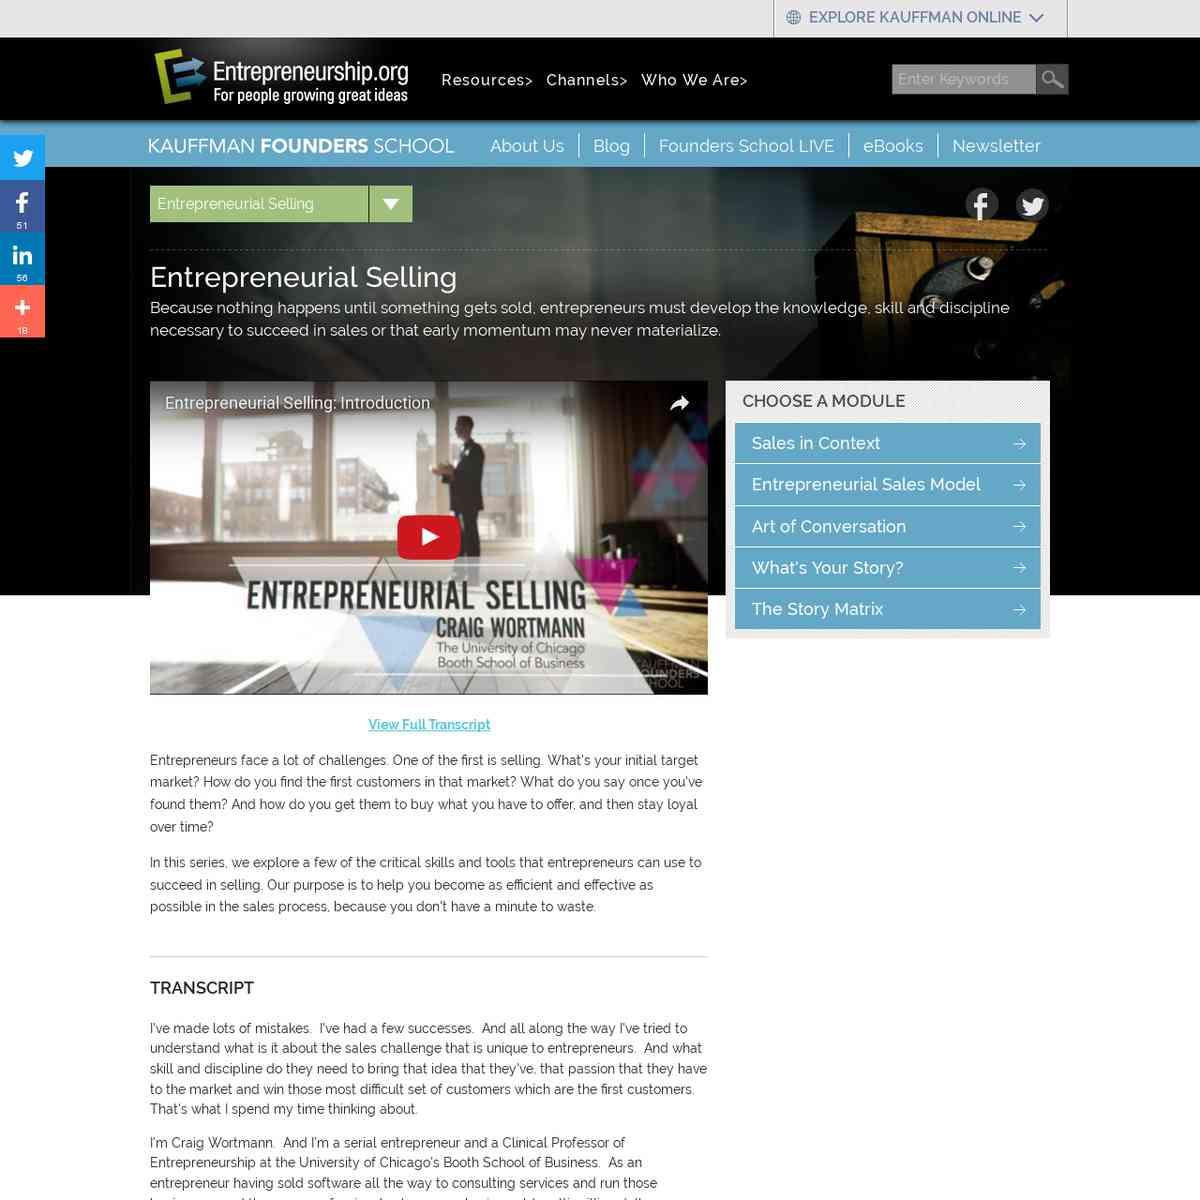 Entrepreneurial Selling || Kauffman Founders School - Entrepreneurship.org